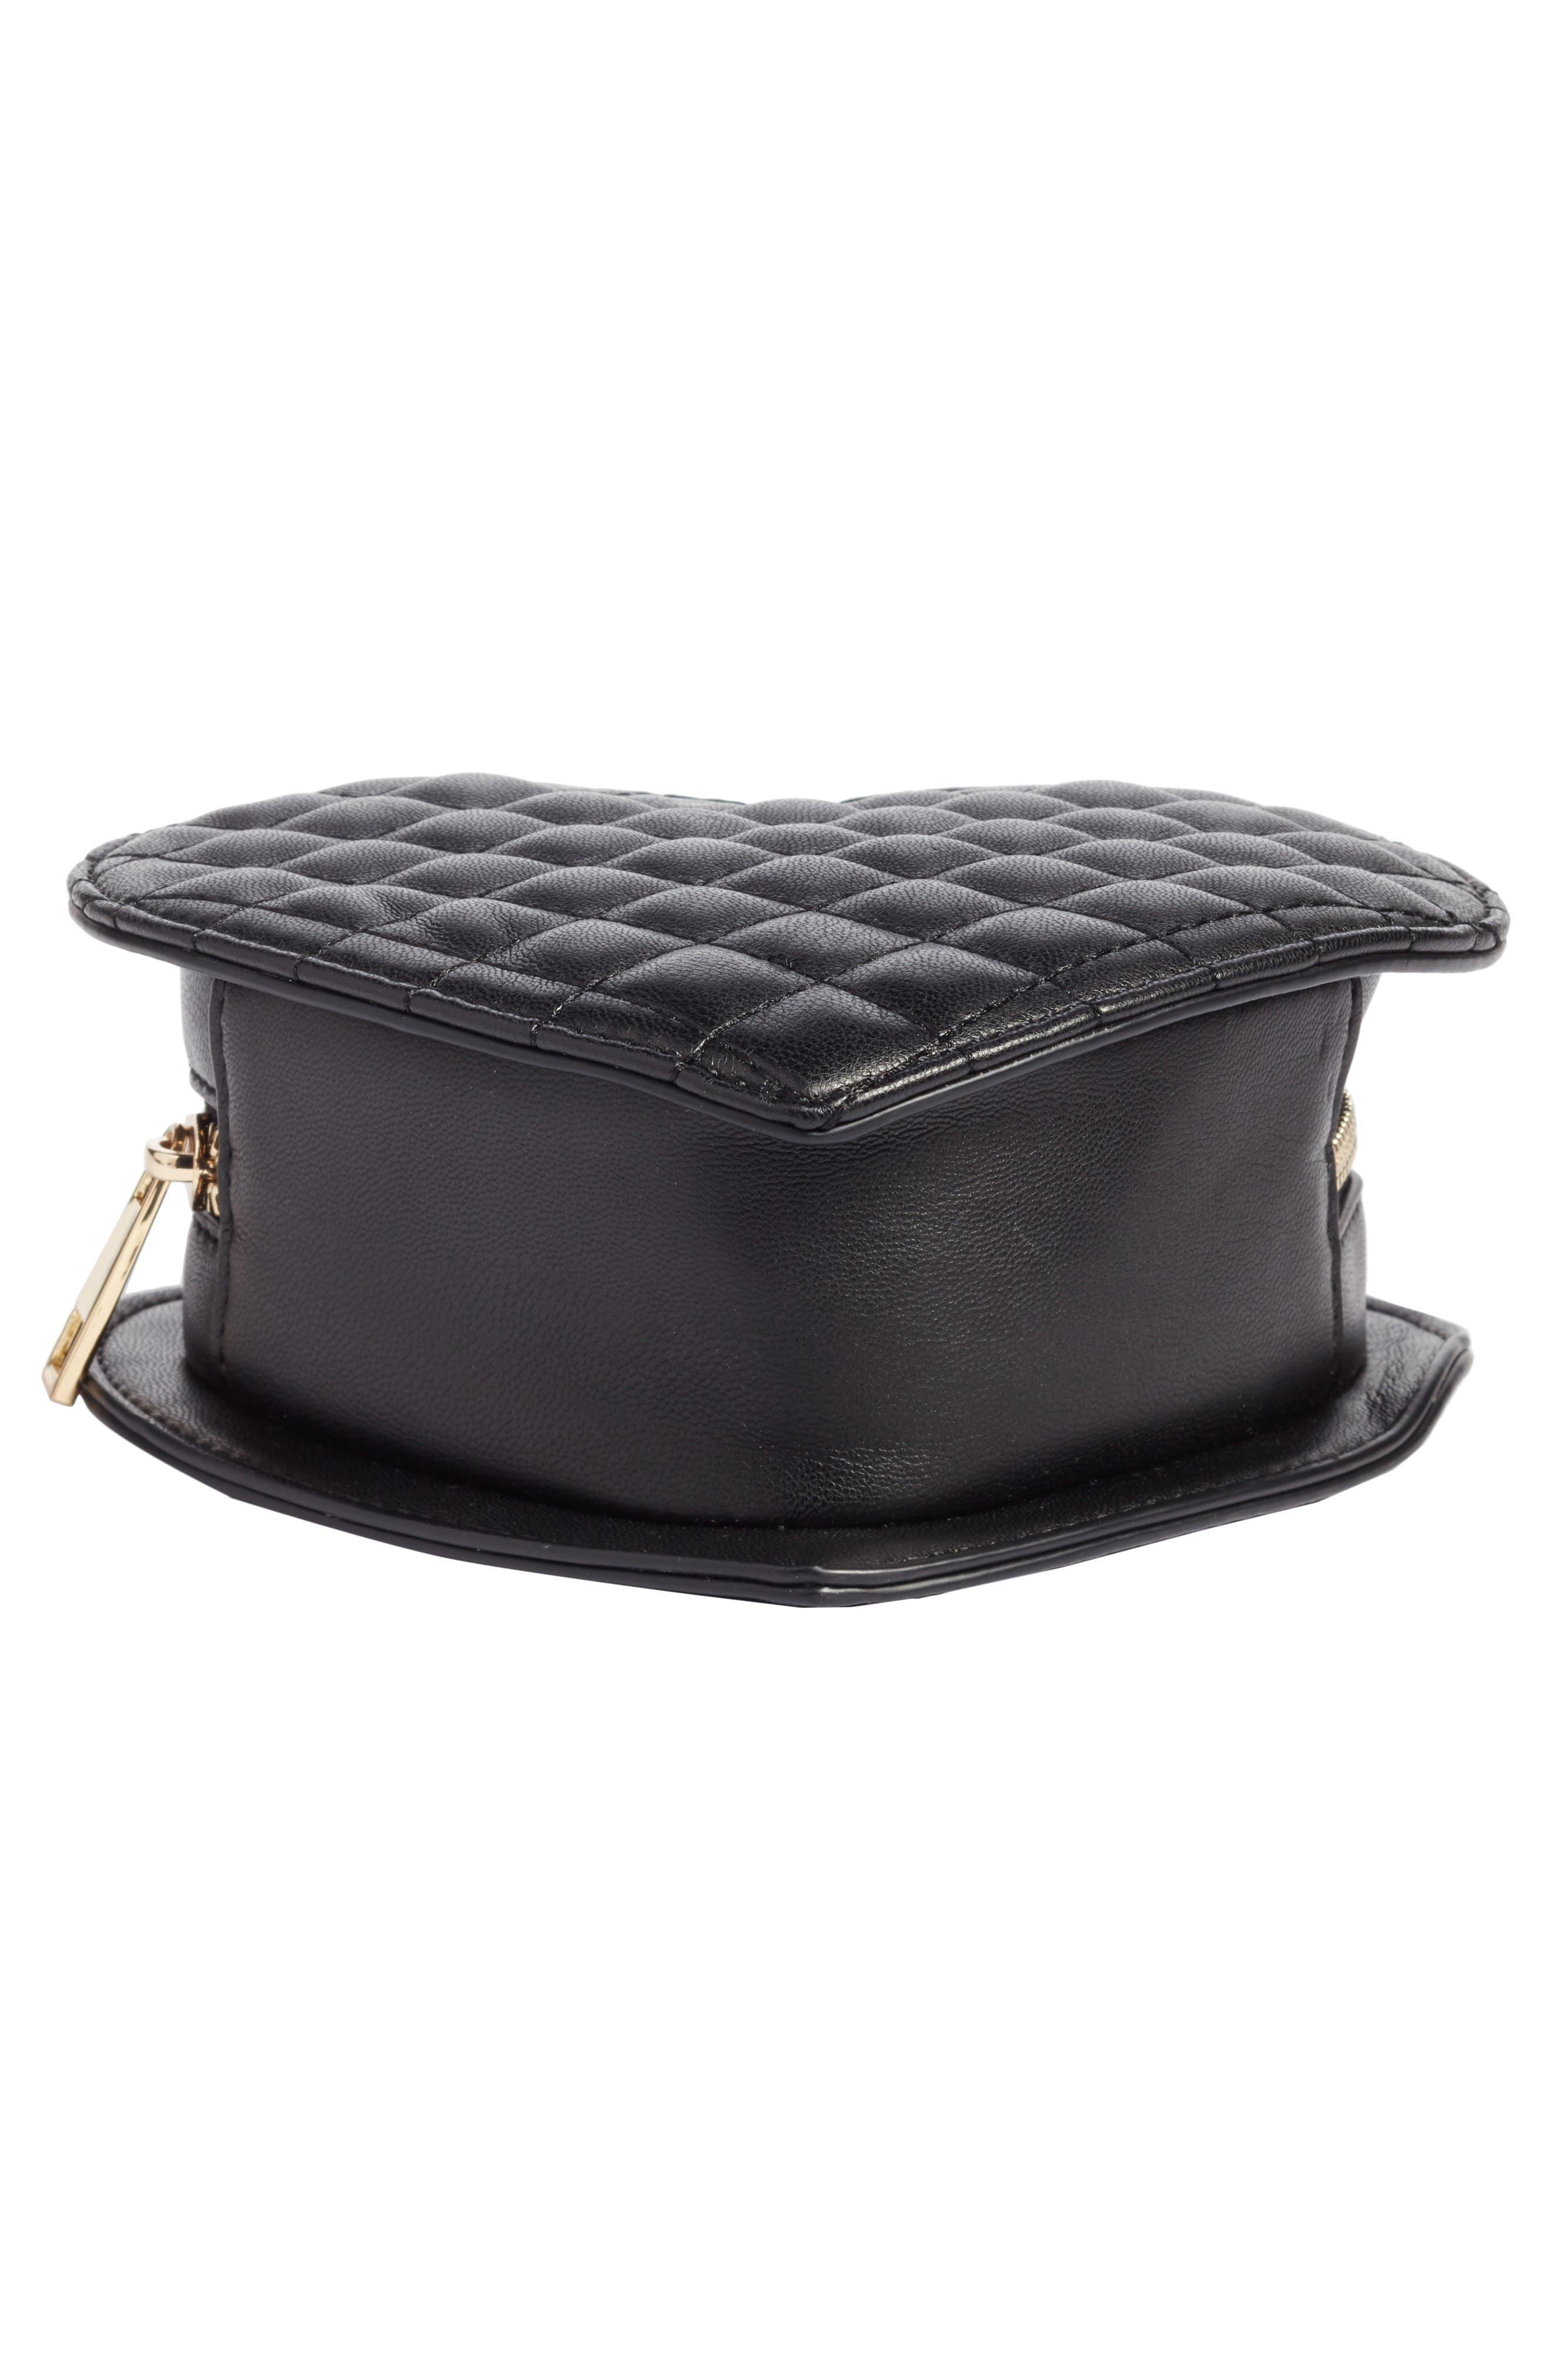 Mali + Lili Quilted Heart Vegan Leather Crossbody Bag,                             Alternate thumbnail 6, color,                             Black